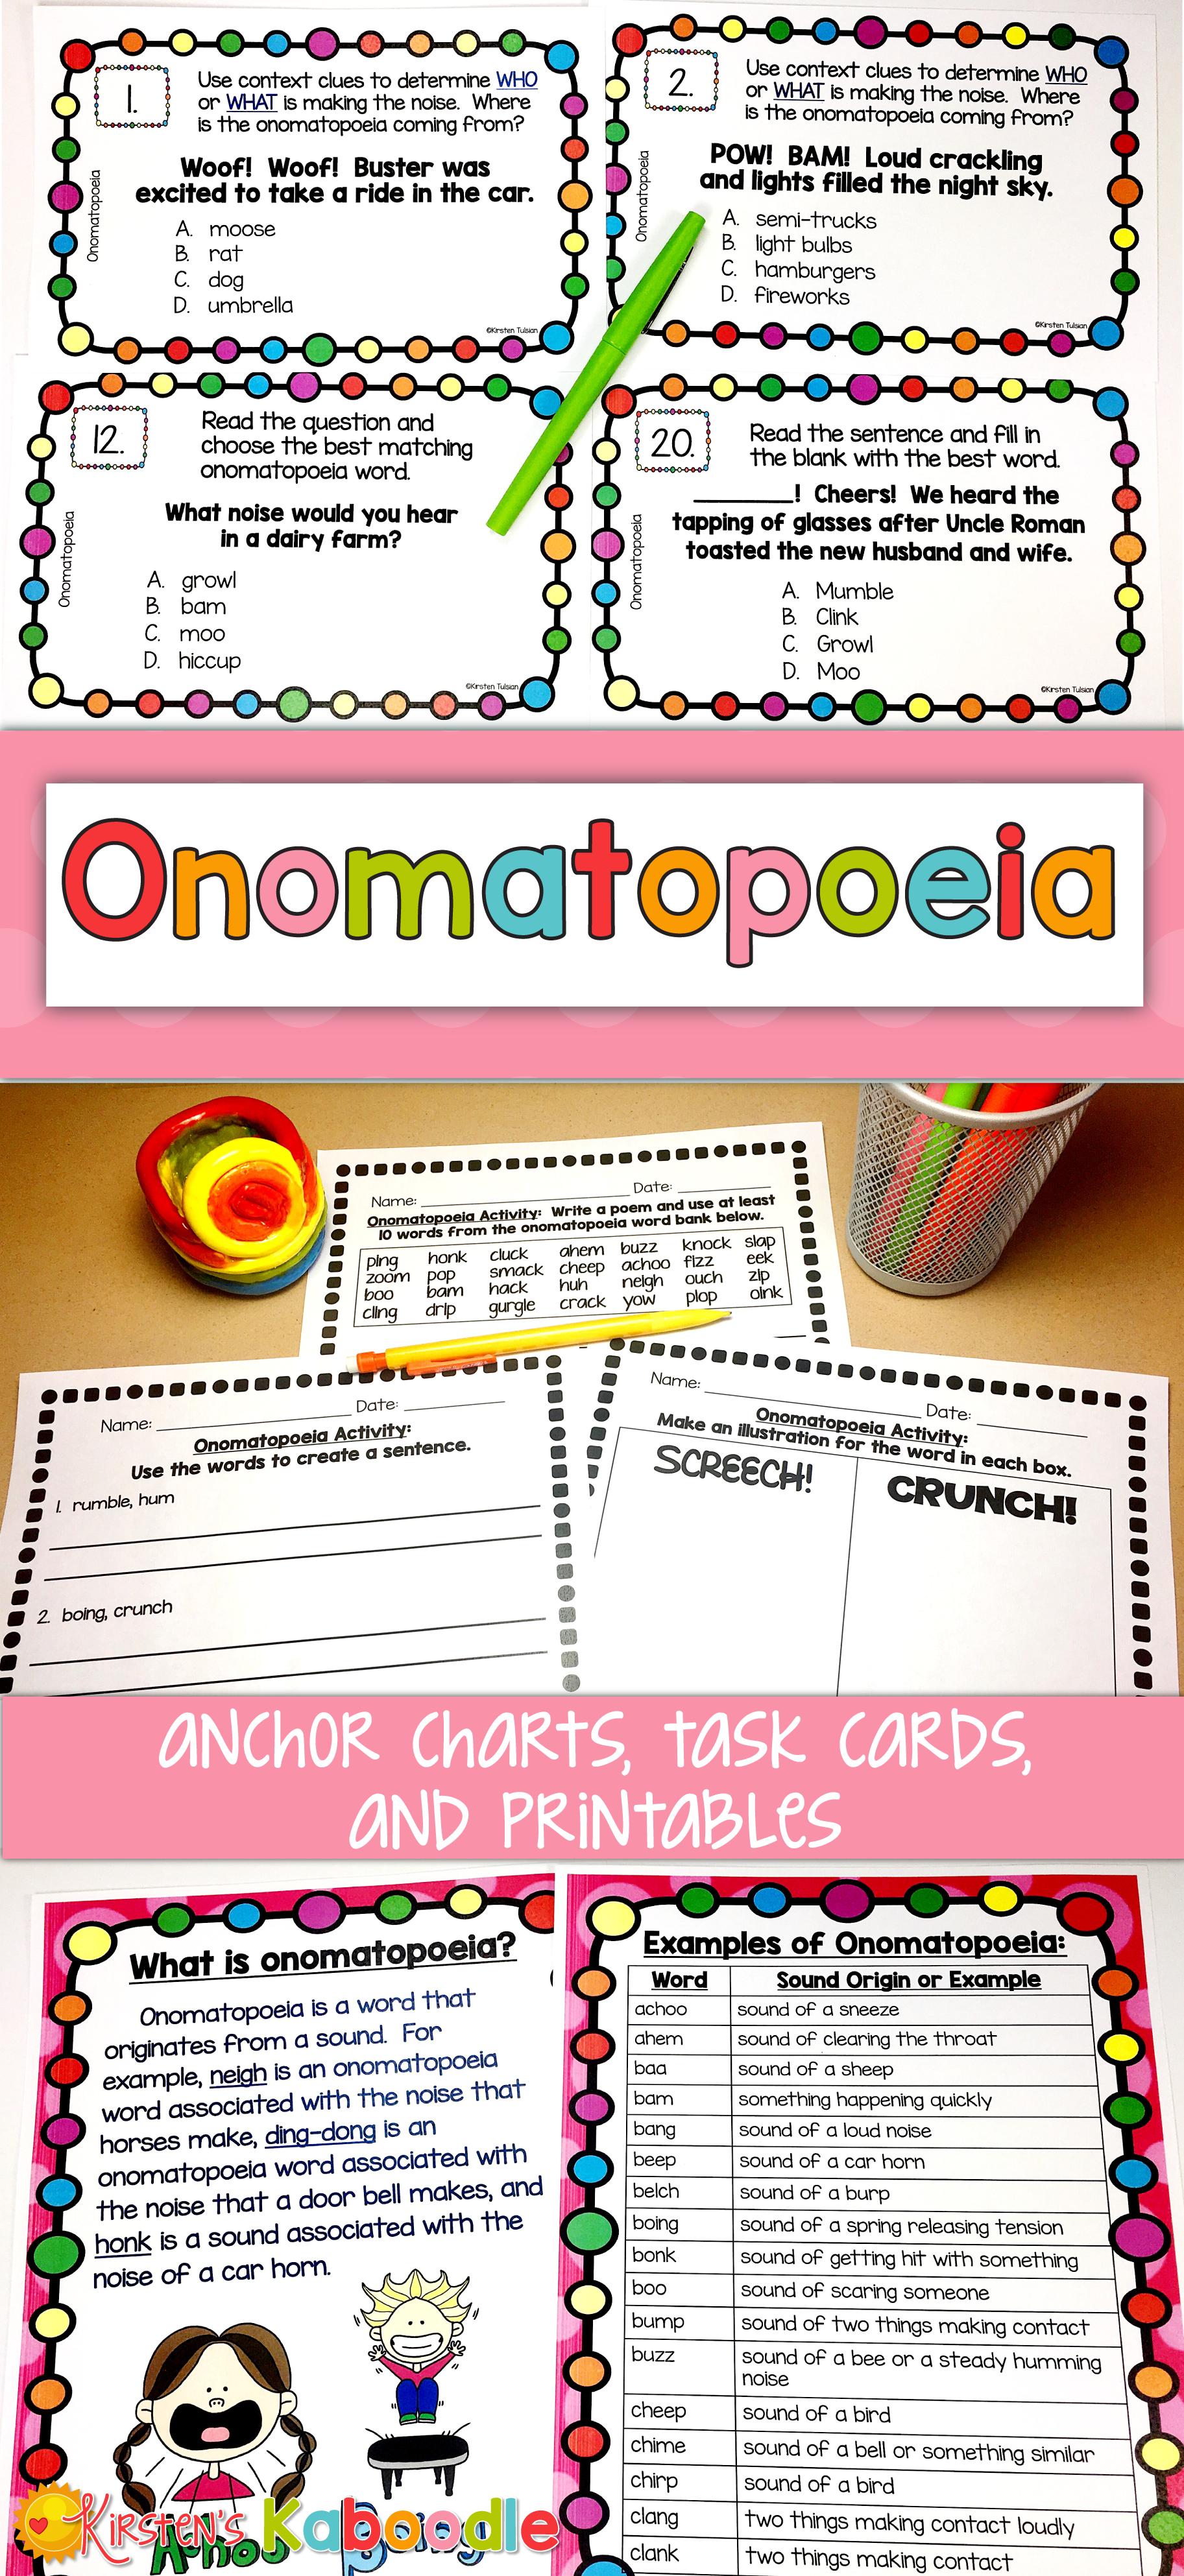 Onomatopoeia Activities And Task Cards